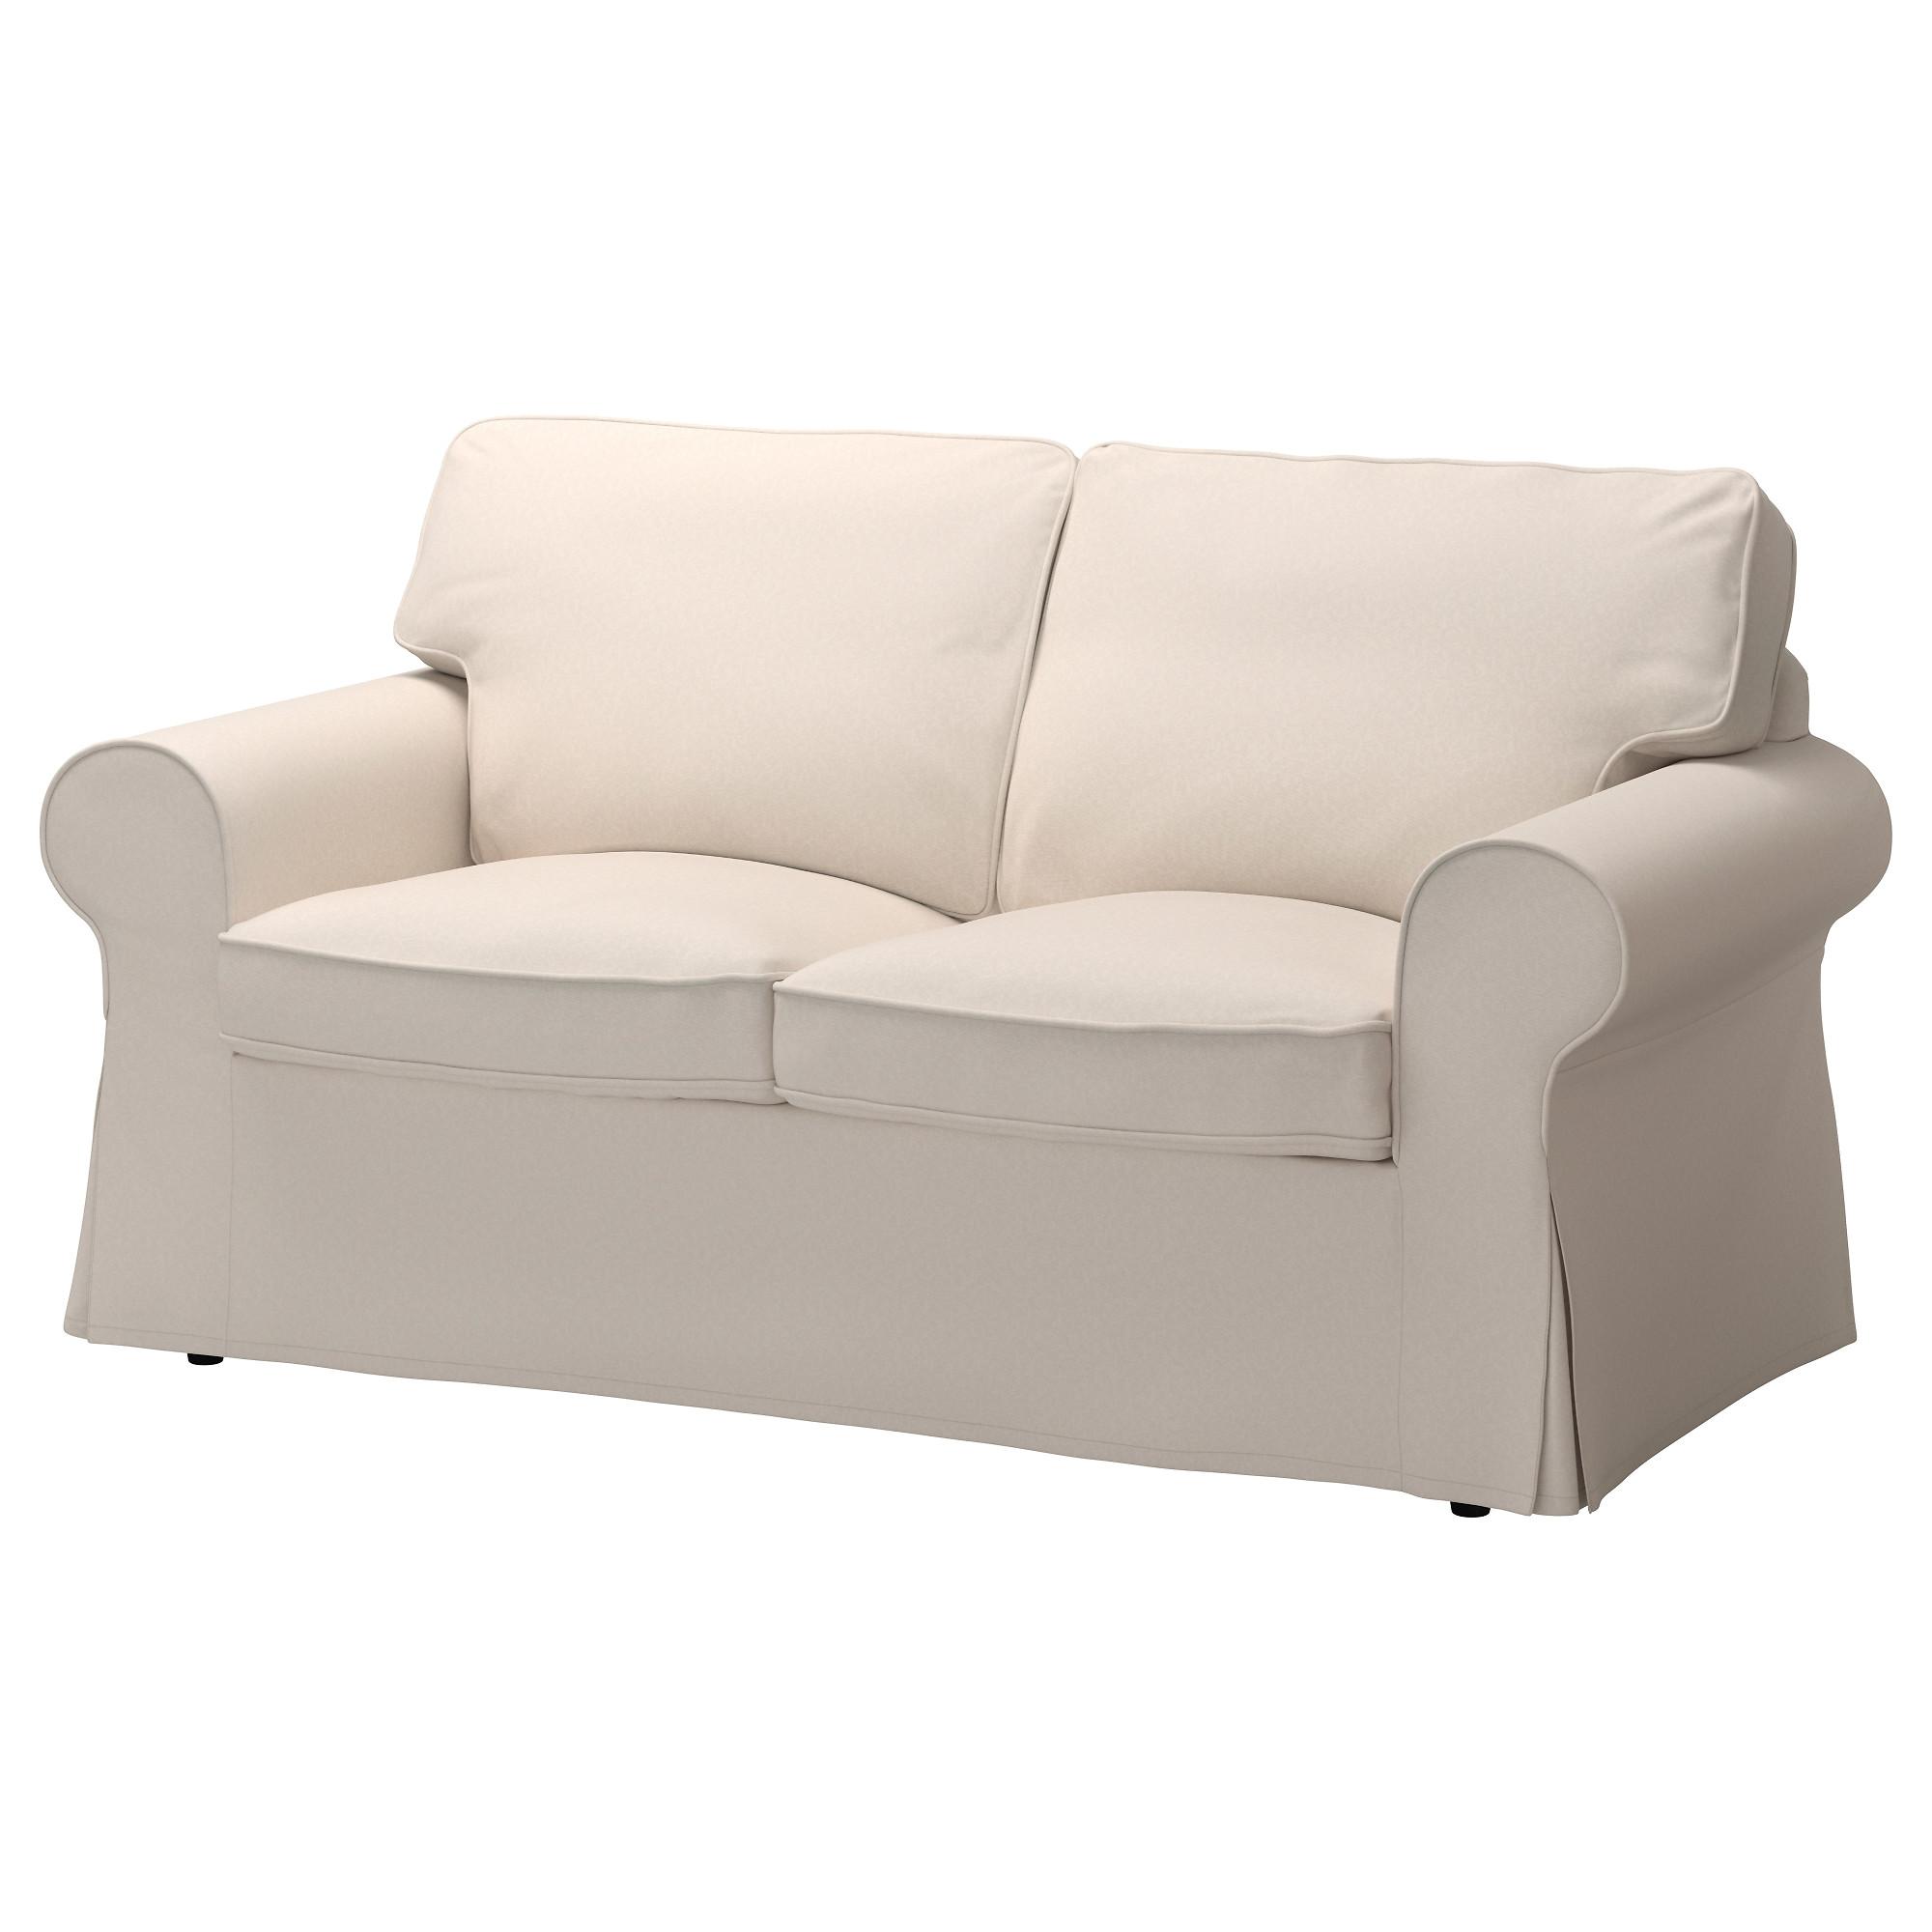 Full Size of Sofa Abnehmbarer Bezug Hussen Modulares Mit Abnehmbarem Big Waschbarer Abnehmbar Waschbar Ikea Abnehmbaren Sofas Grau Ektorp 2er Lofallet Beige Kleines Home Sofa Sofa Abnehmbarer Bezug